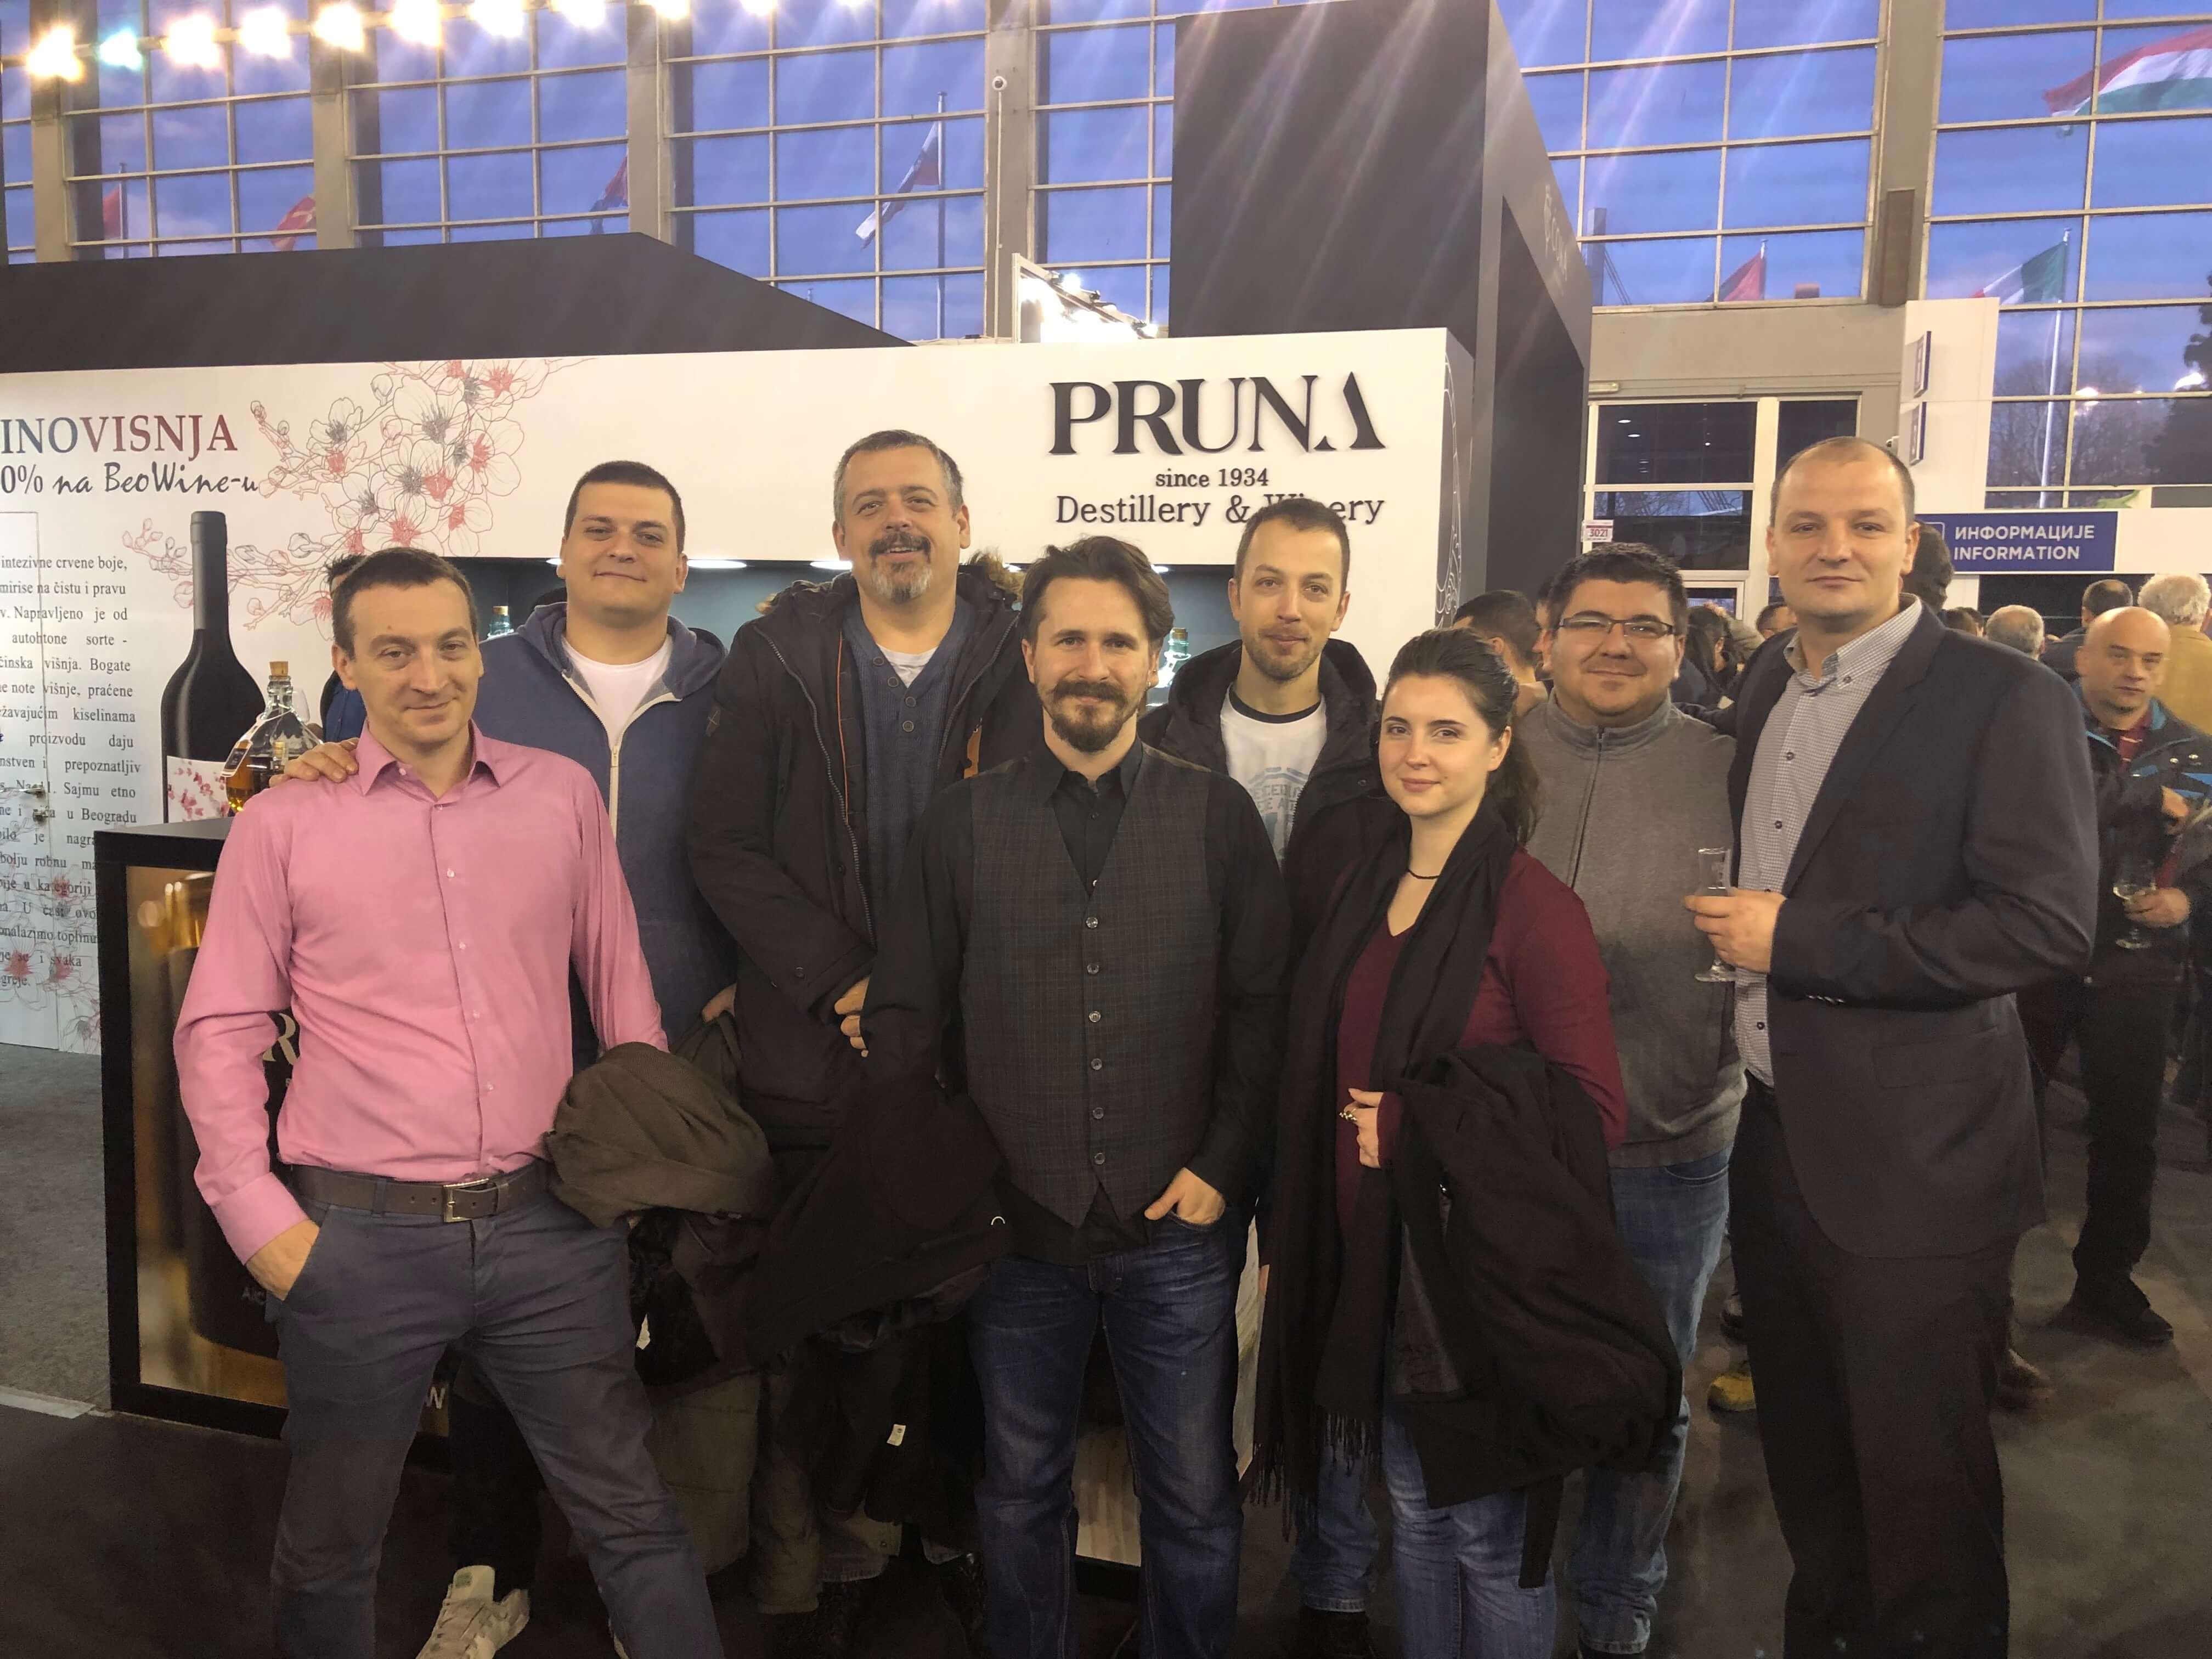 ACTIV8 meets Pruna at Belgrade's Food and Drinks Fair